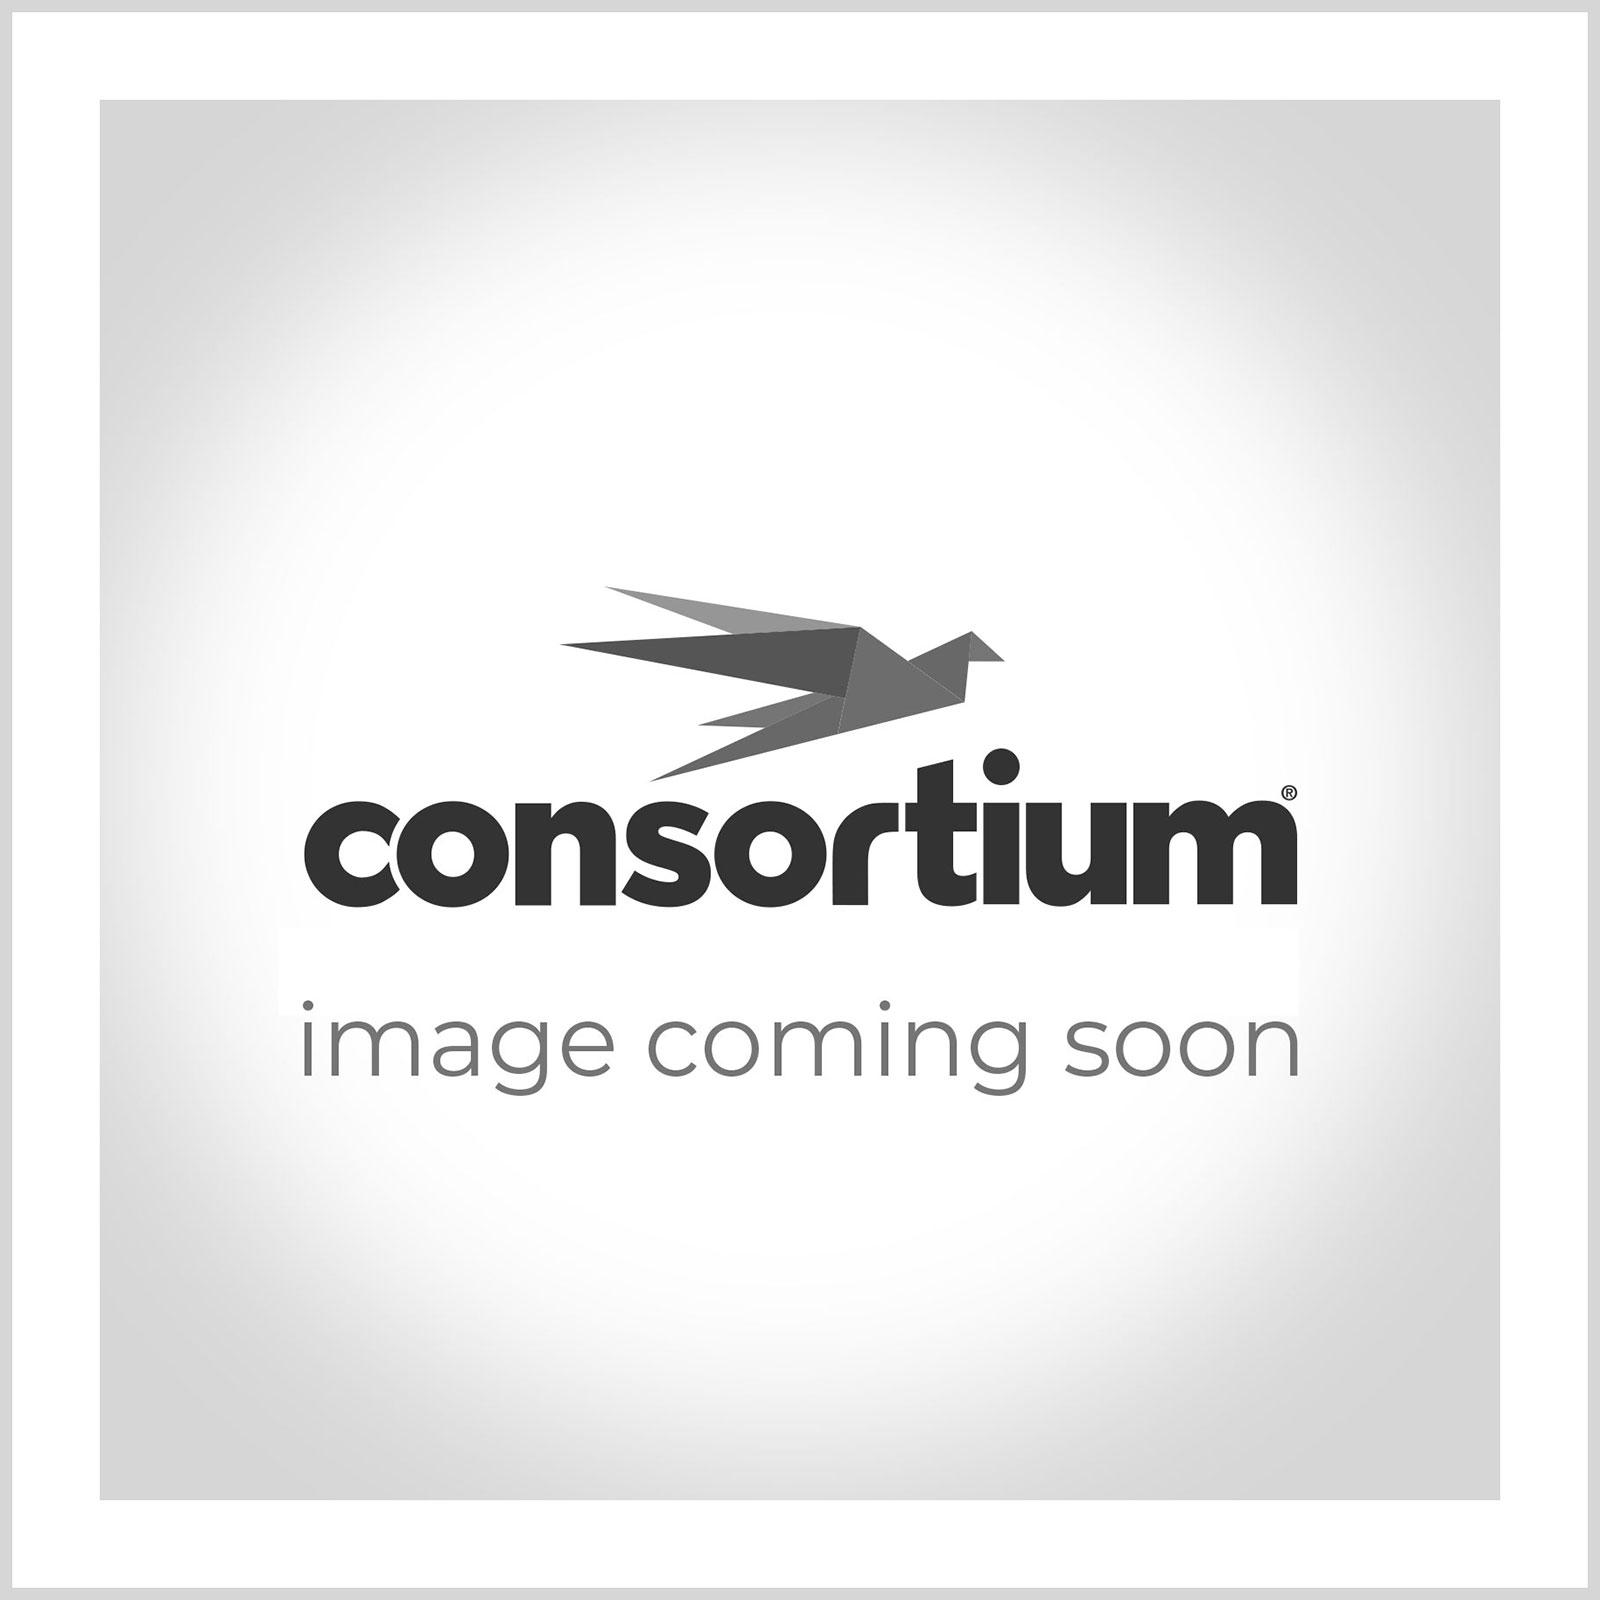 Trumpet Base Bistro Table